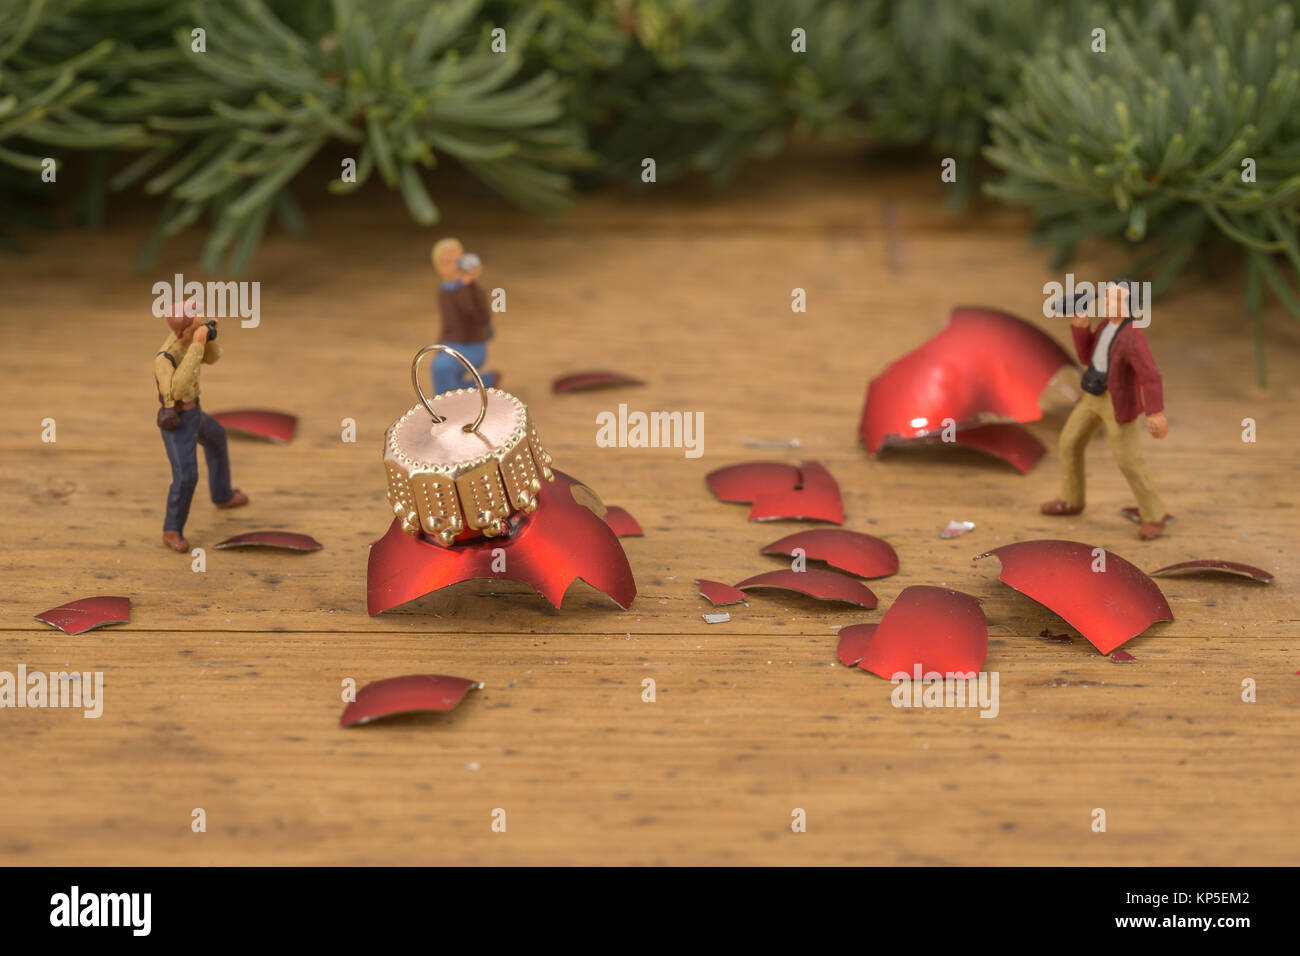 Miniature people photographers figures at broken red christmas balls - Stock Image